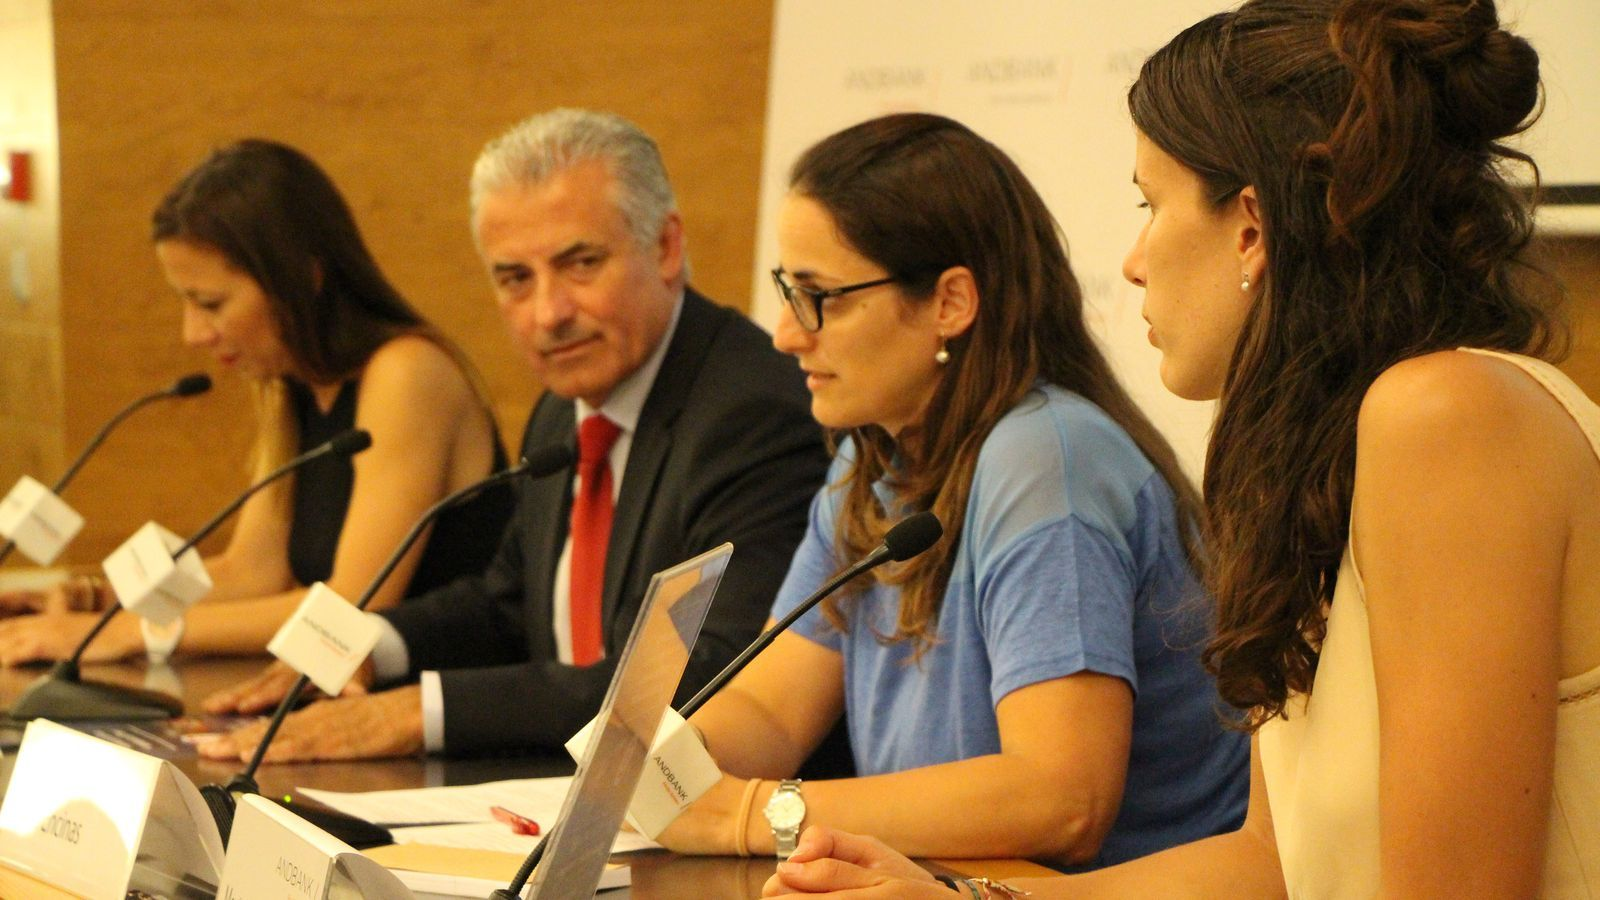 Marta Ballús, de màrqueting de Pyrénées, Sílvia Encinas promotora de la iniciativa, el sotsdirector general d'Andbank, Josep Maria Cabanes i Anna Hernàndez de Proactiva Open Arms